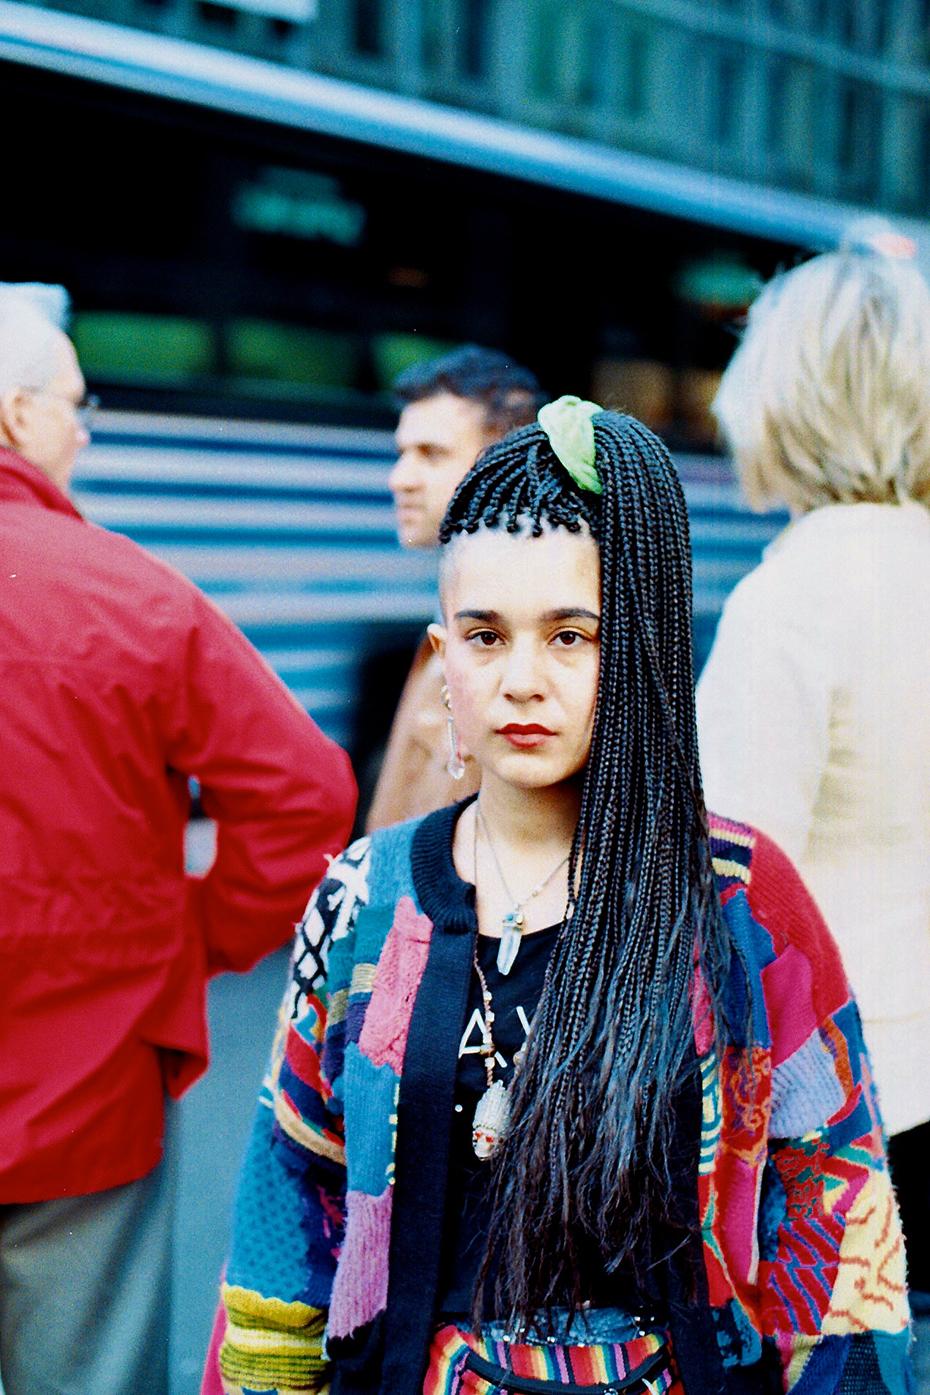 NYC girl.jpg